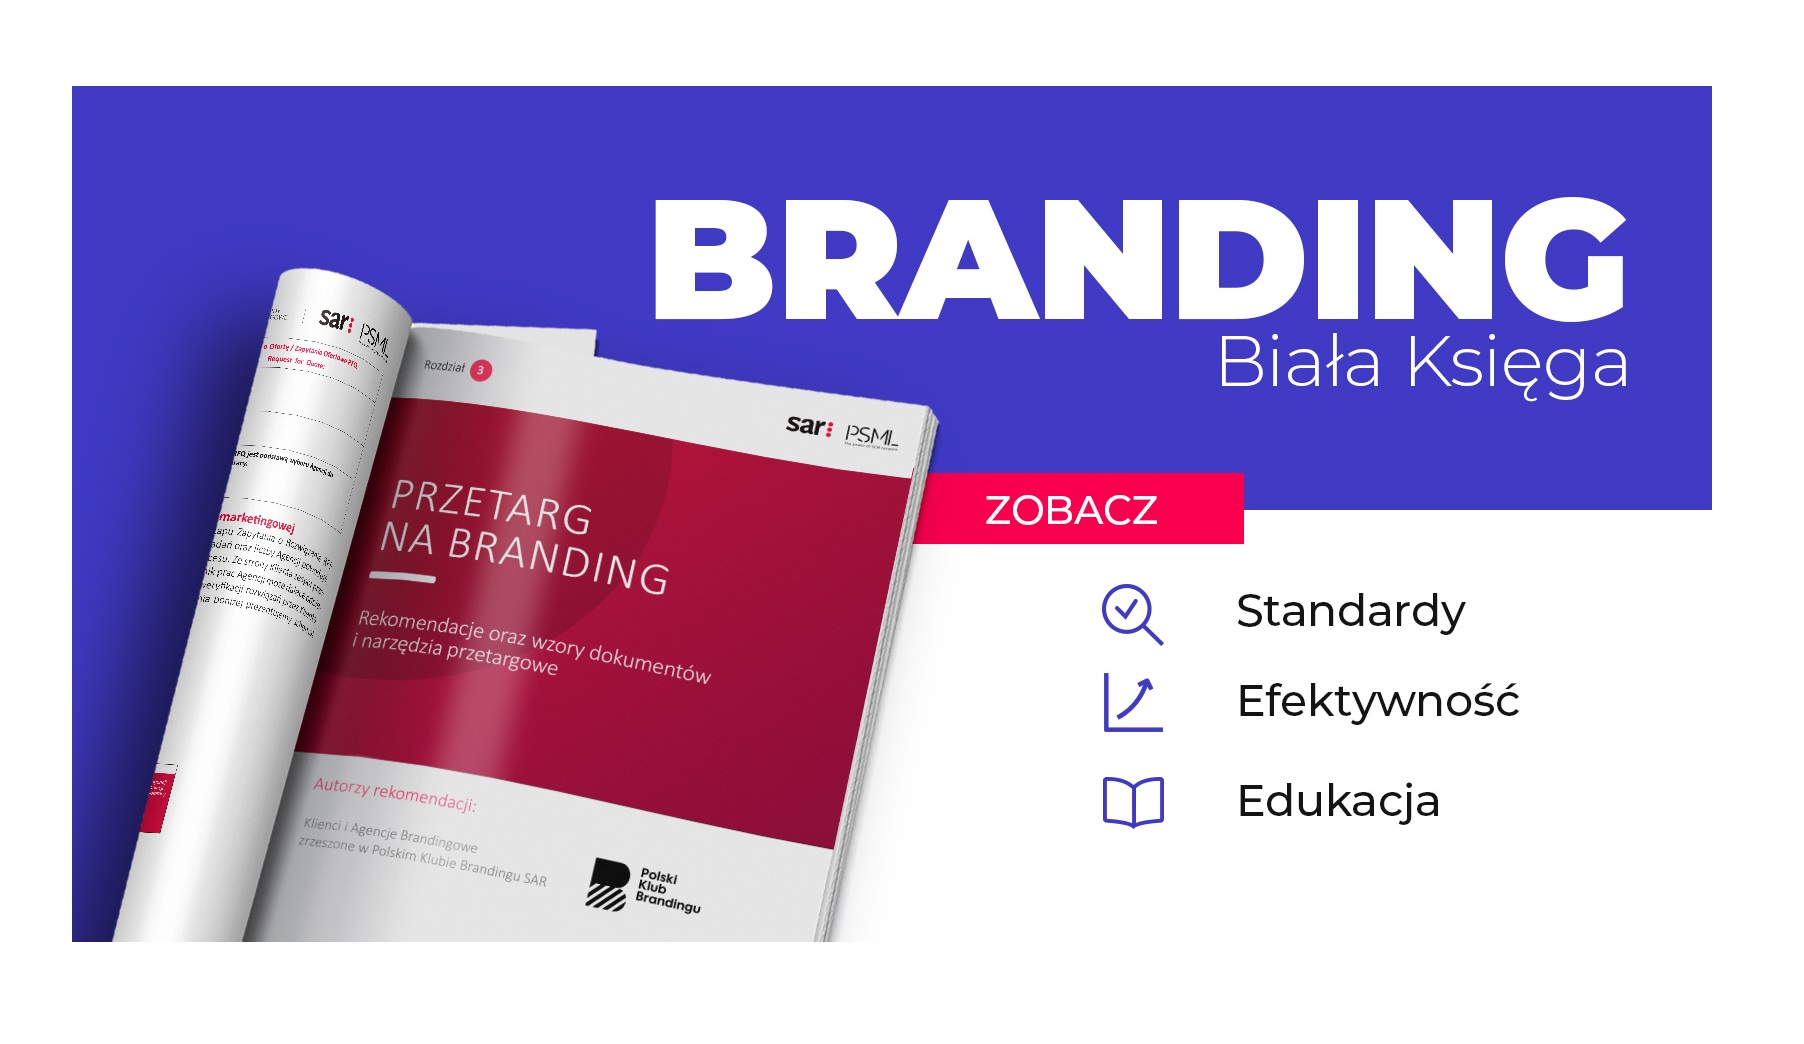 Biała Księga Branding już dostępna